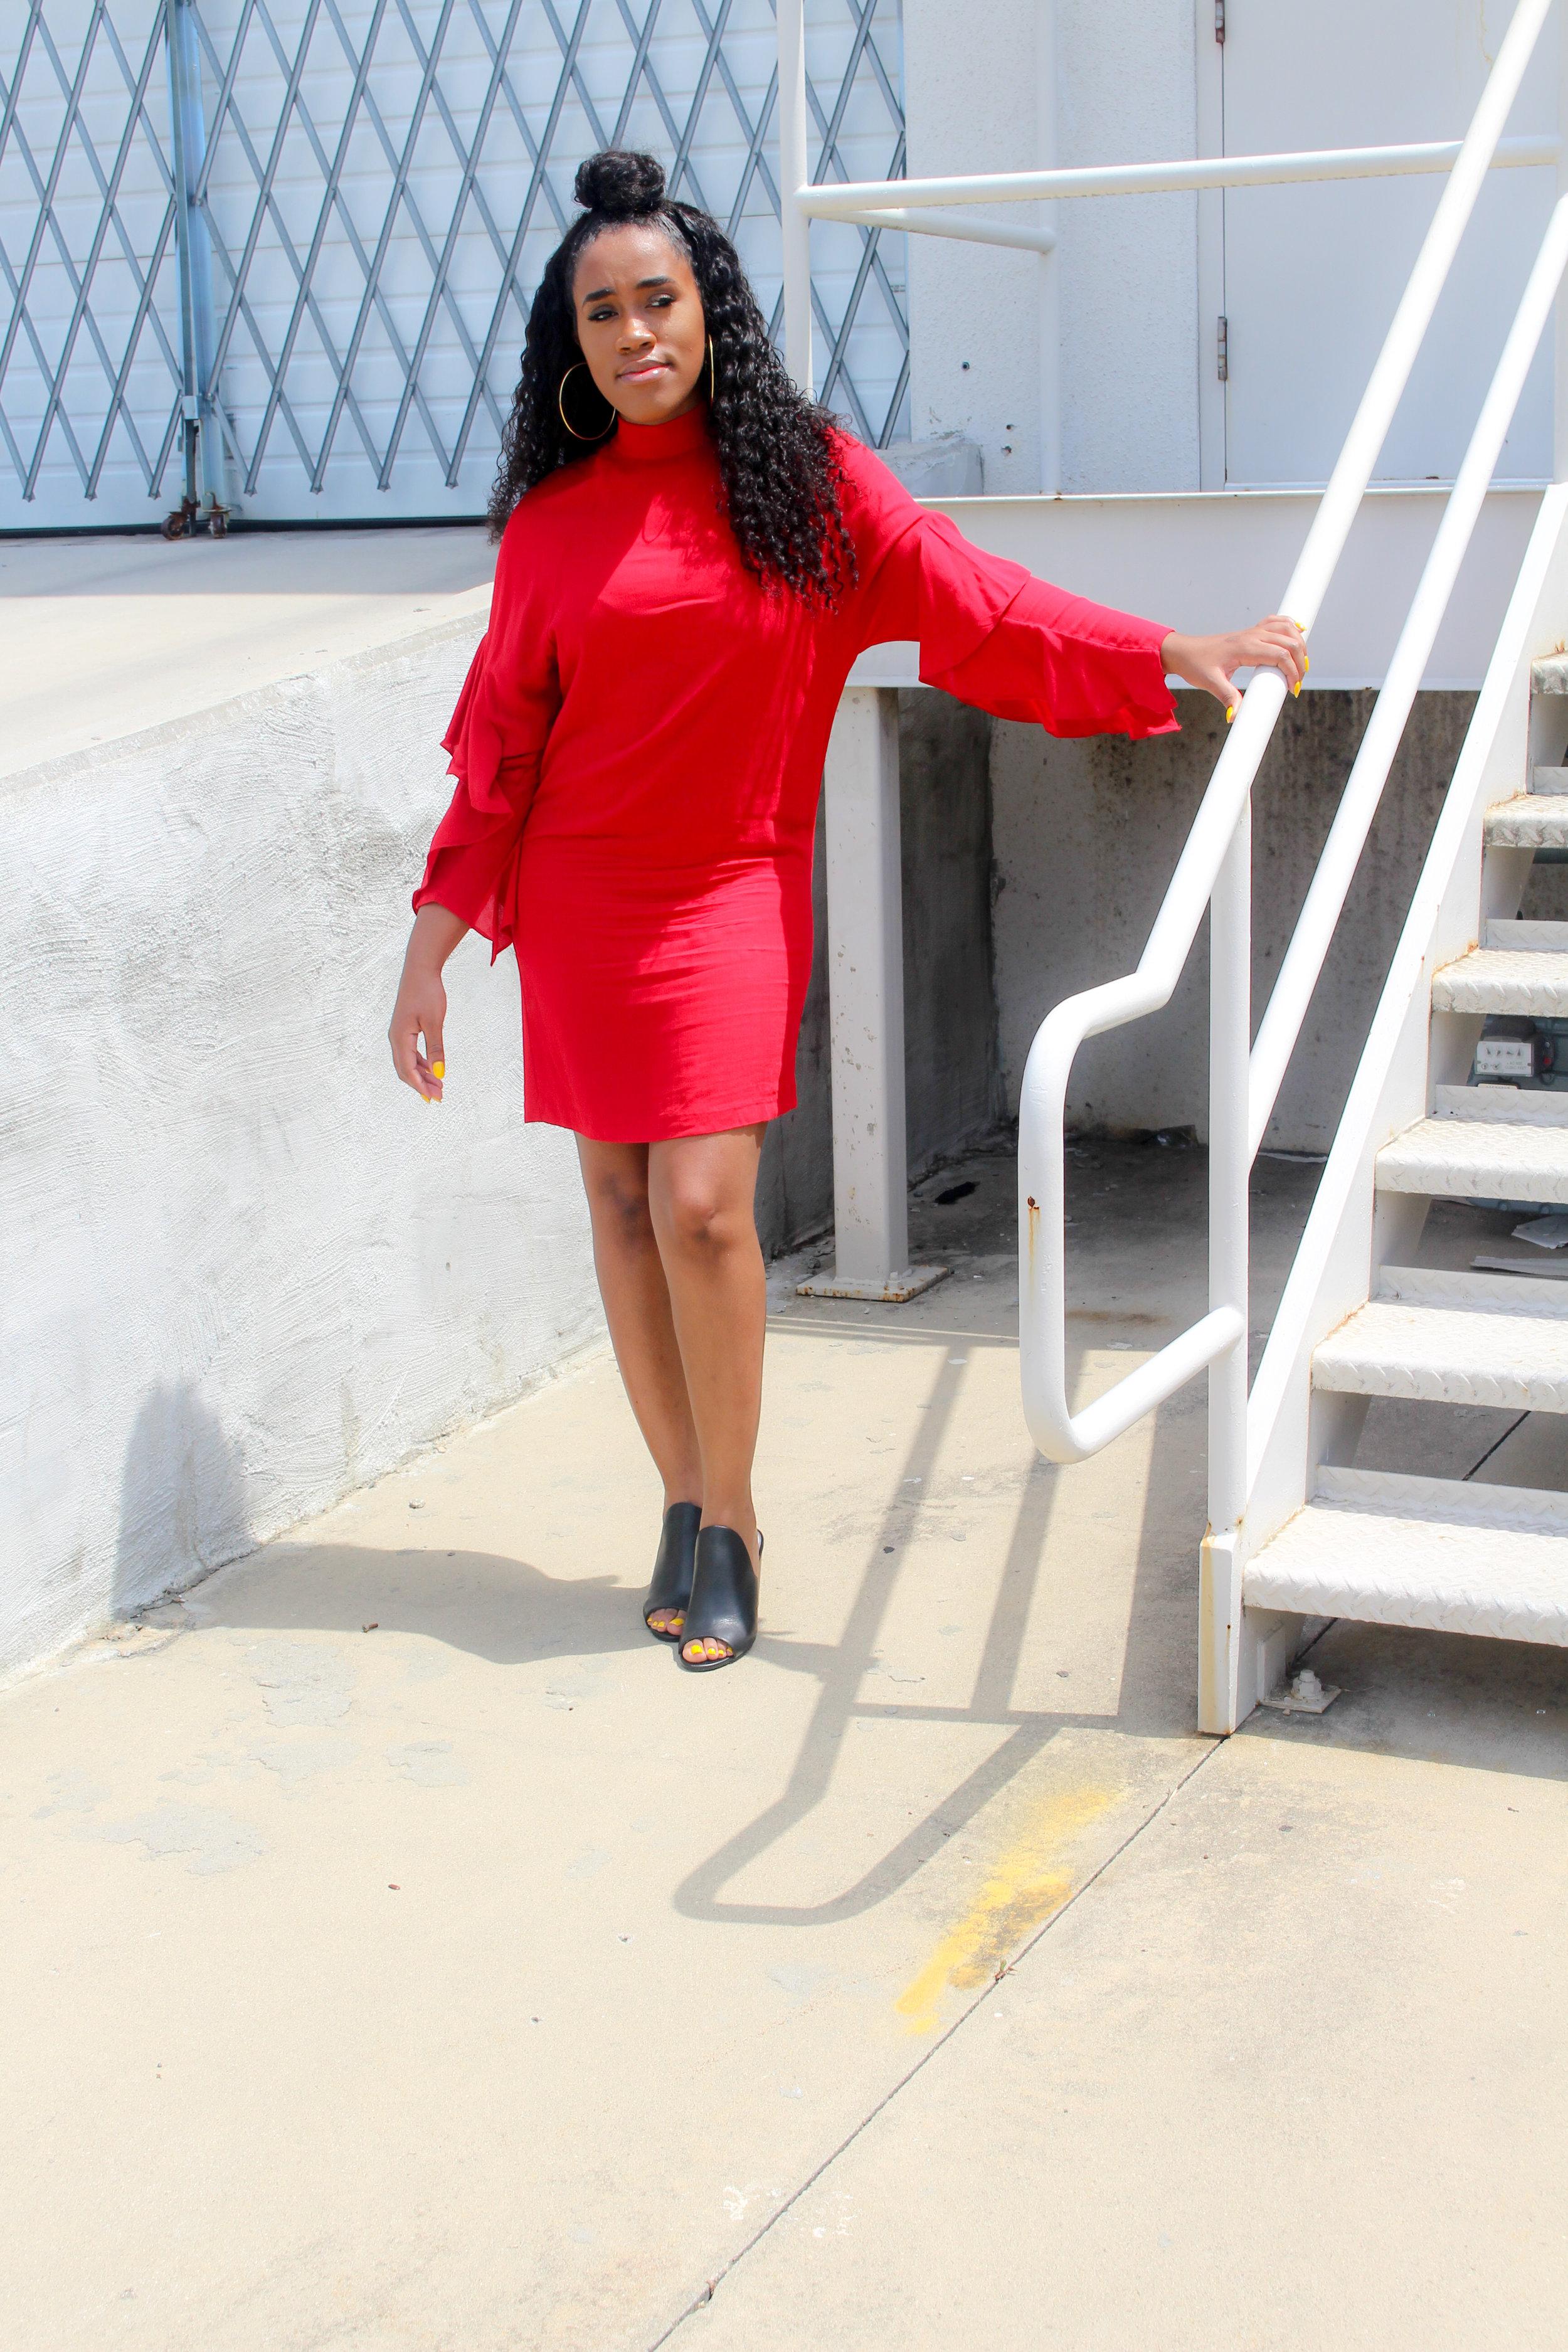 Red Dress #2.jpg